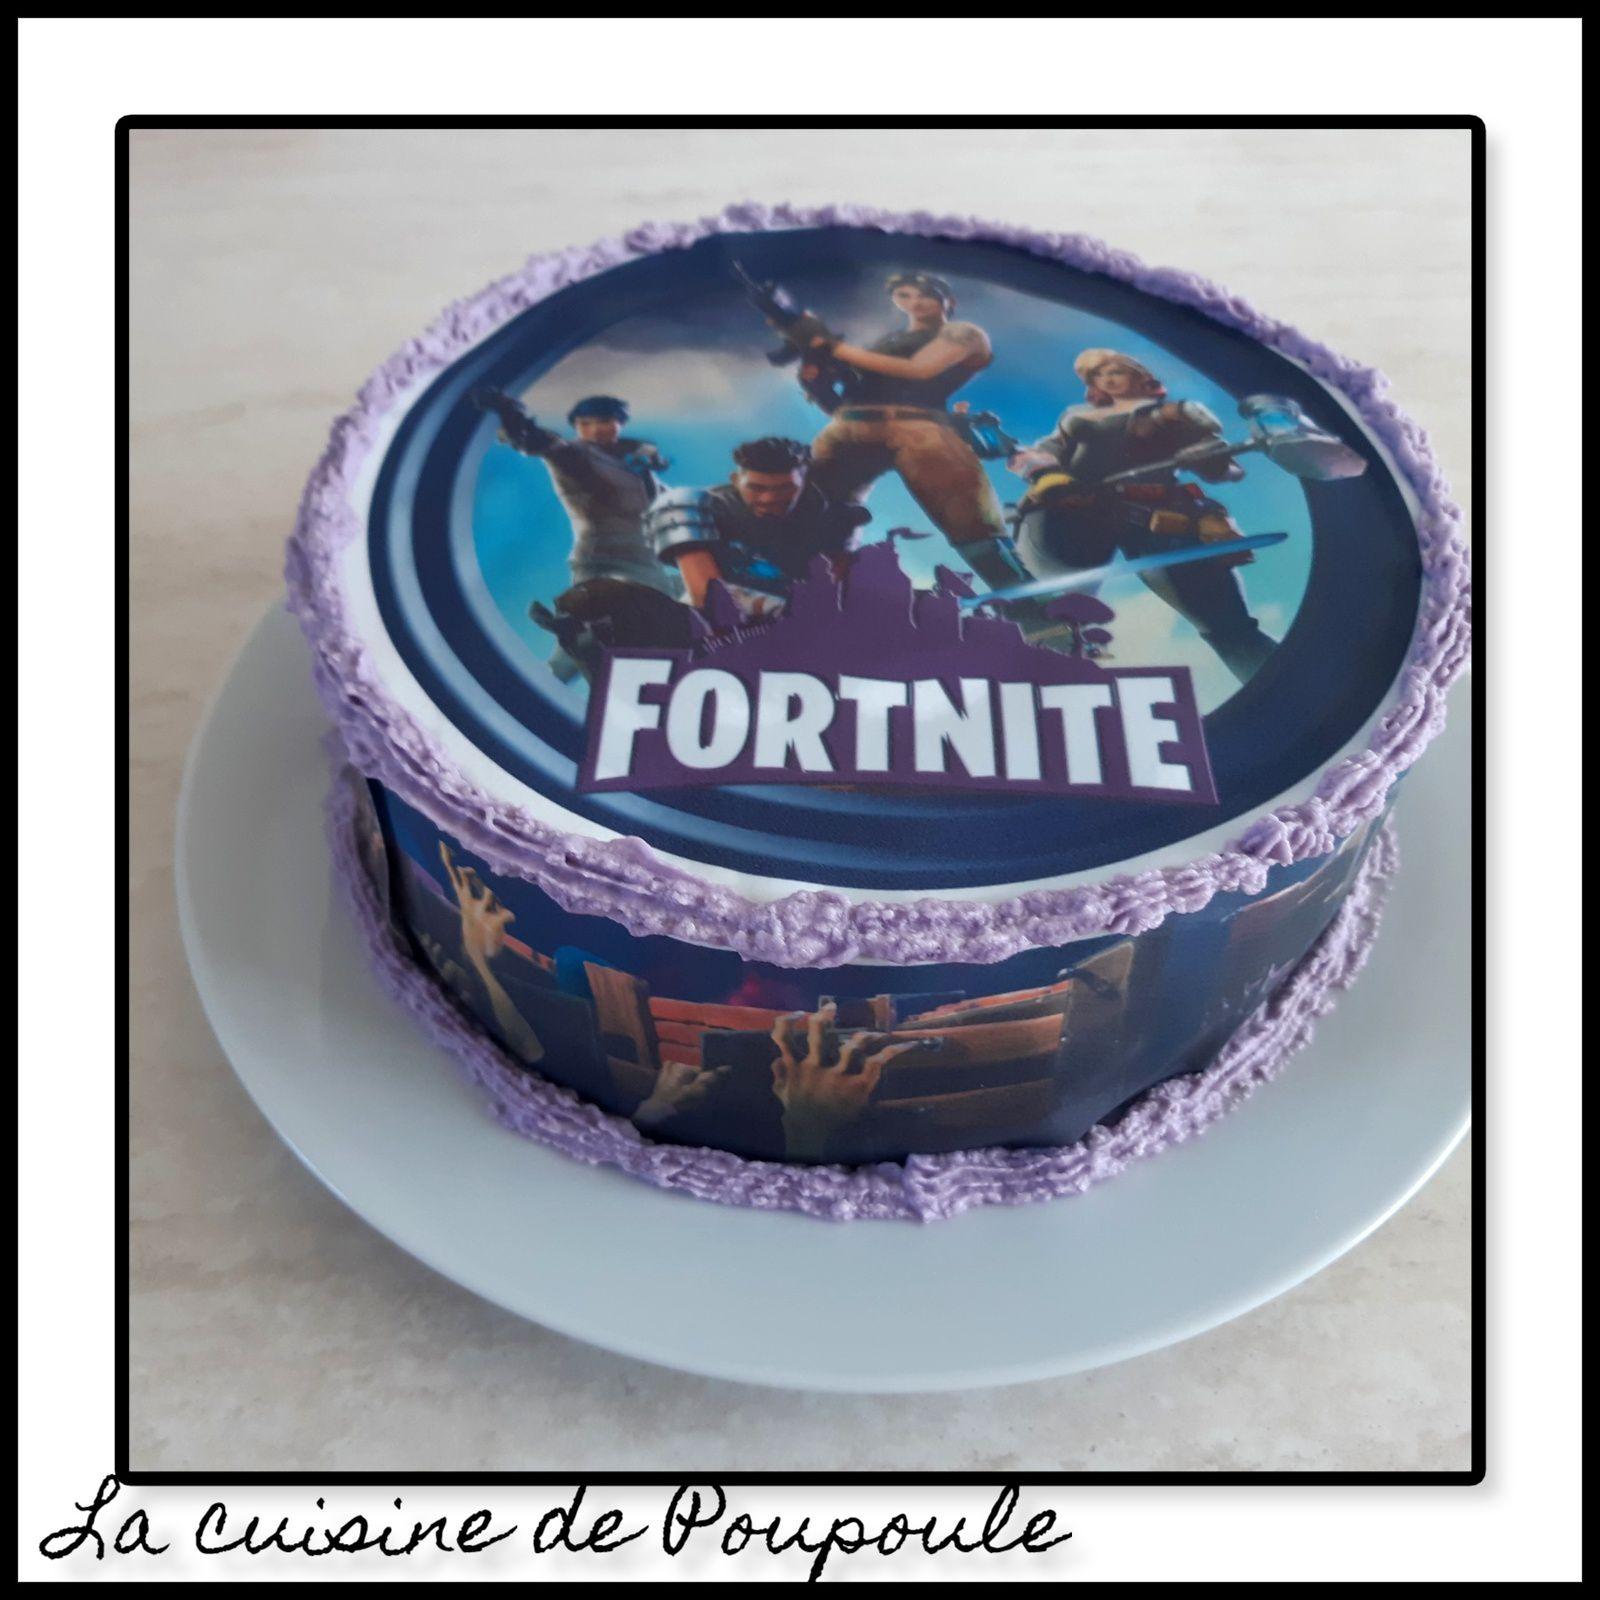 Gâteau Fortnite (molly cake au chocolat, ganache noix de coco)